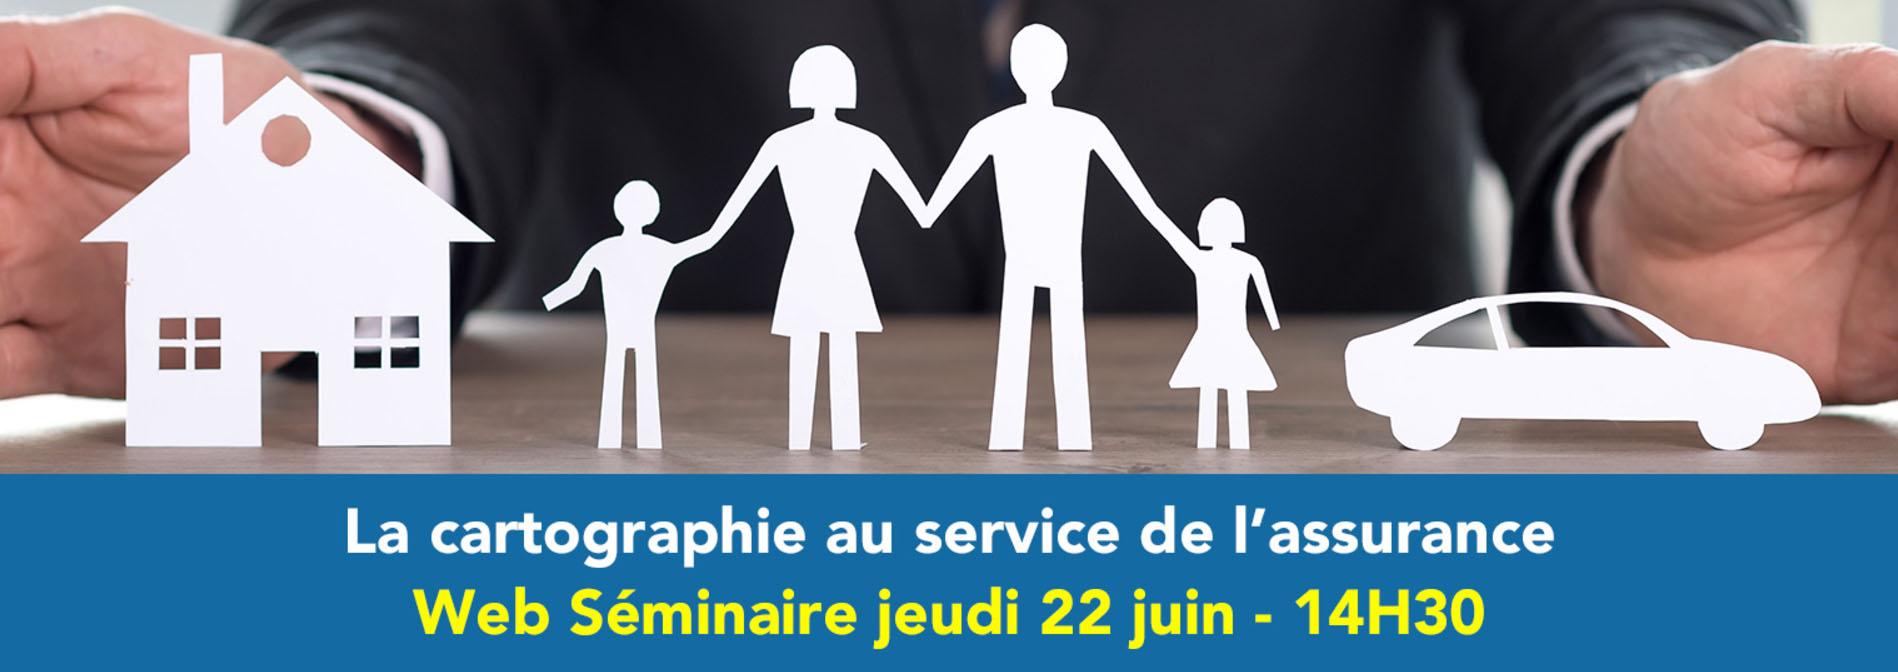 http://www2.esrifrance.fr/l/66542/2017-06-08/b9w1bb/66542/155303/WS_assurances.jpg